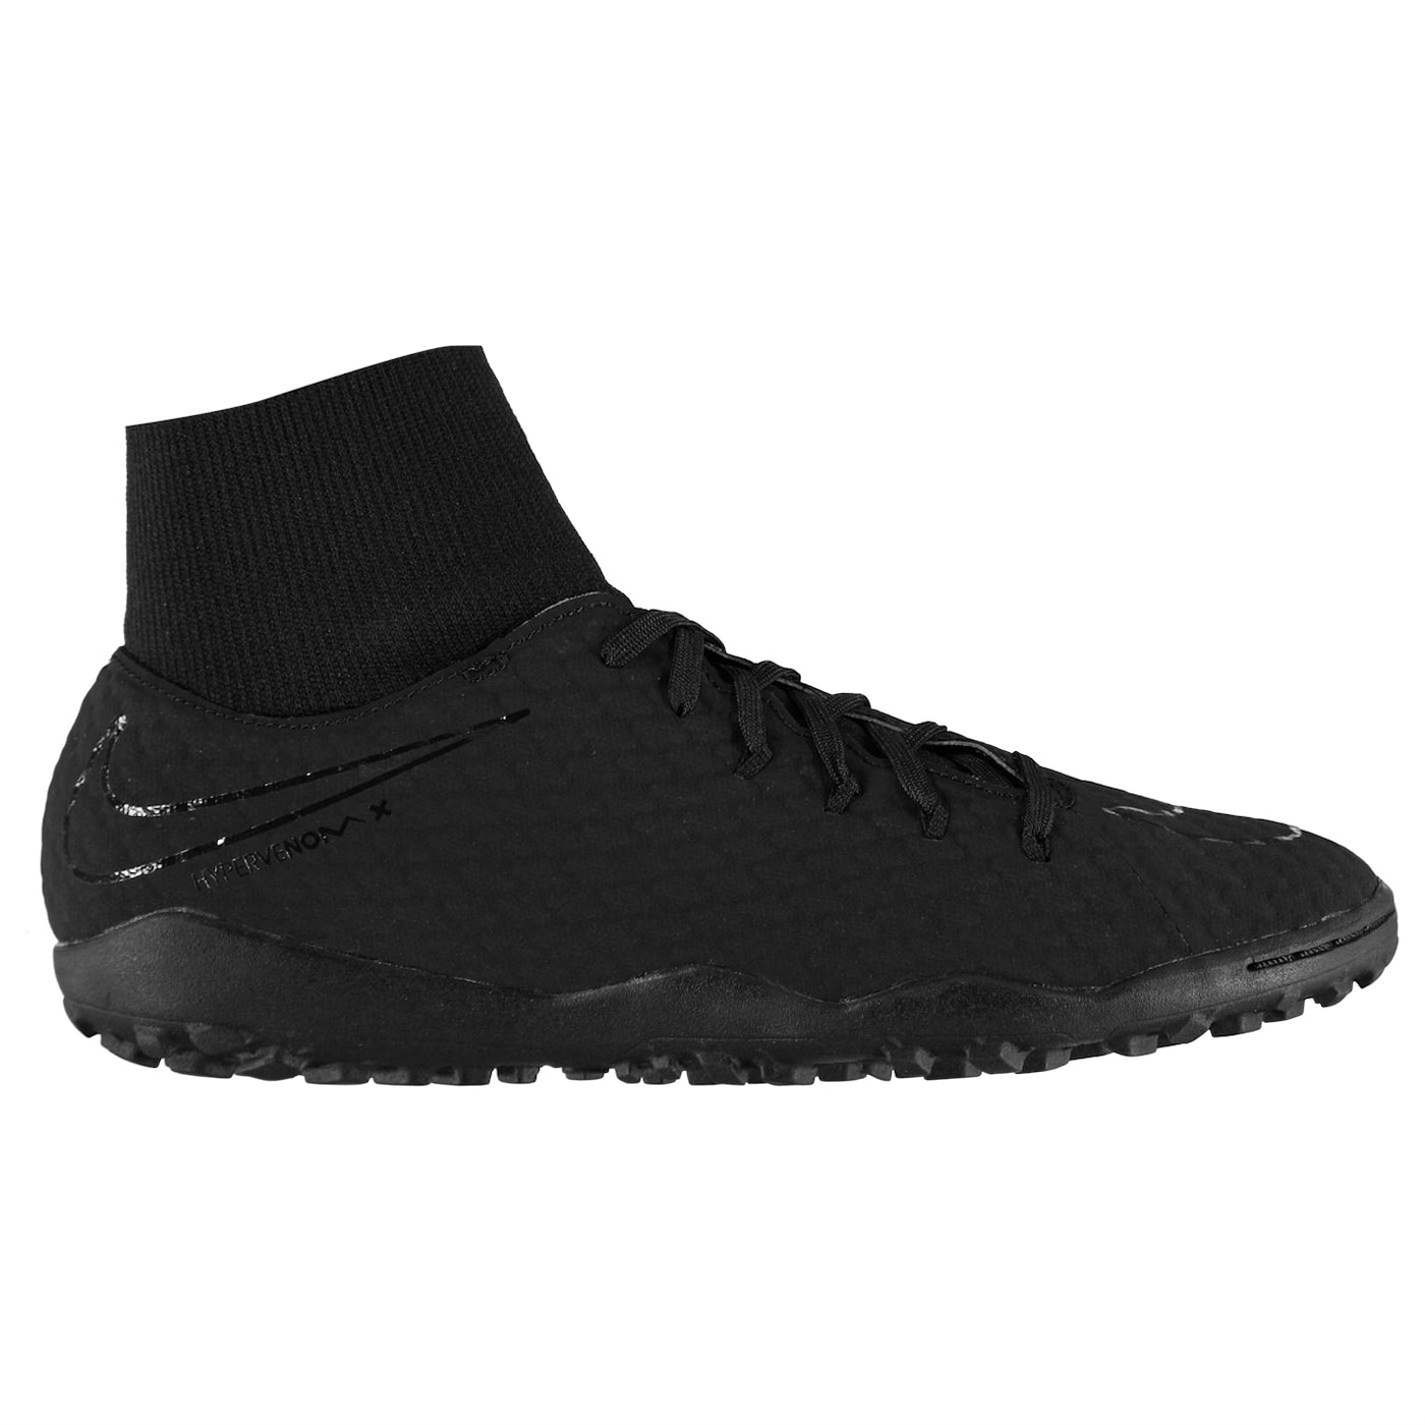 Nike Hypervenom Phelon III DF Mens Astro Turf Trainers